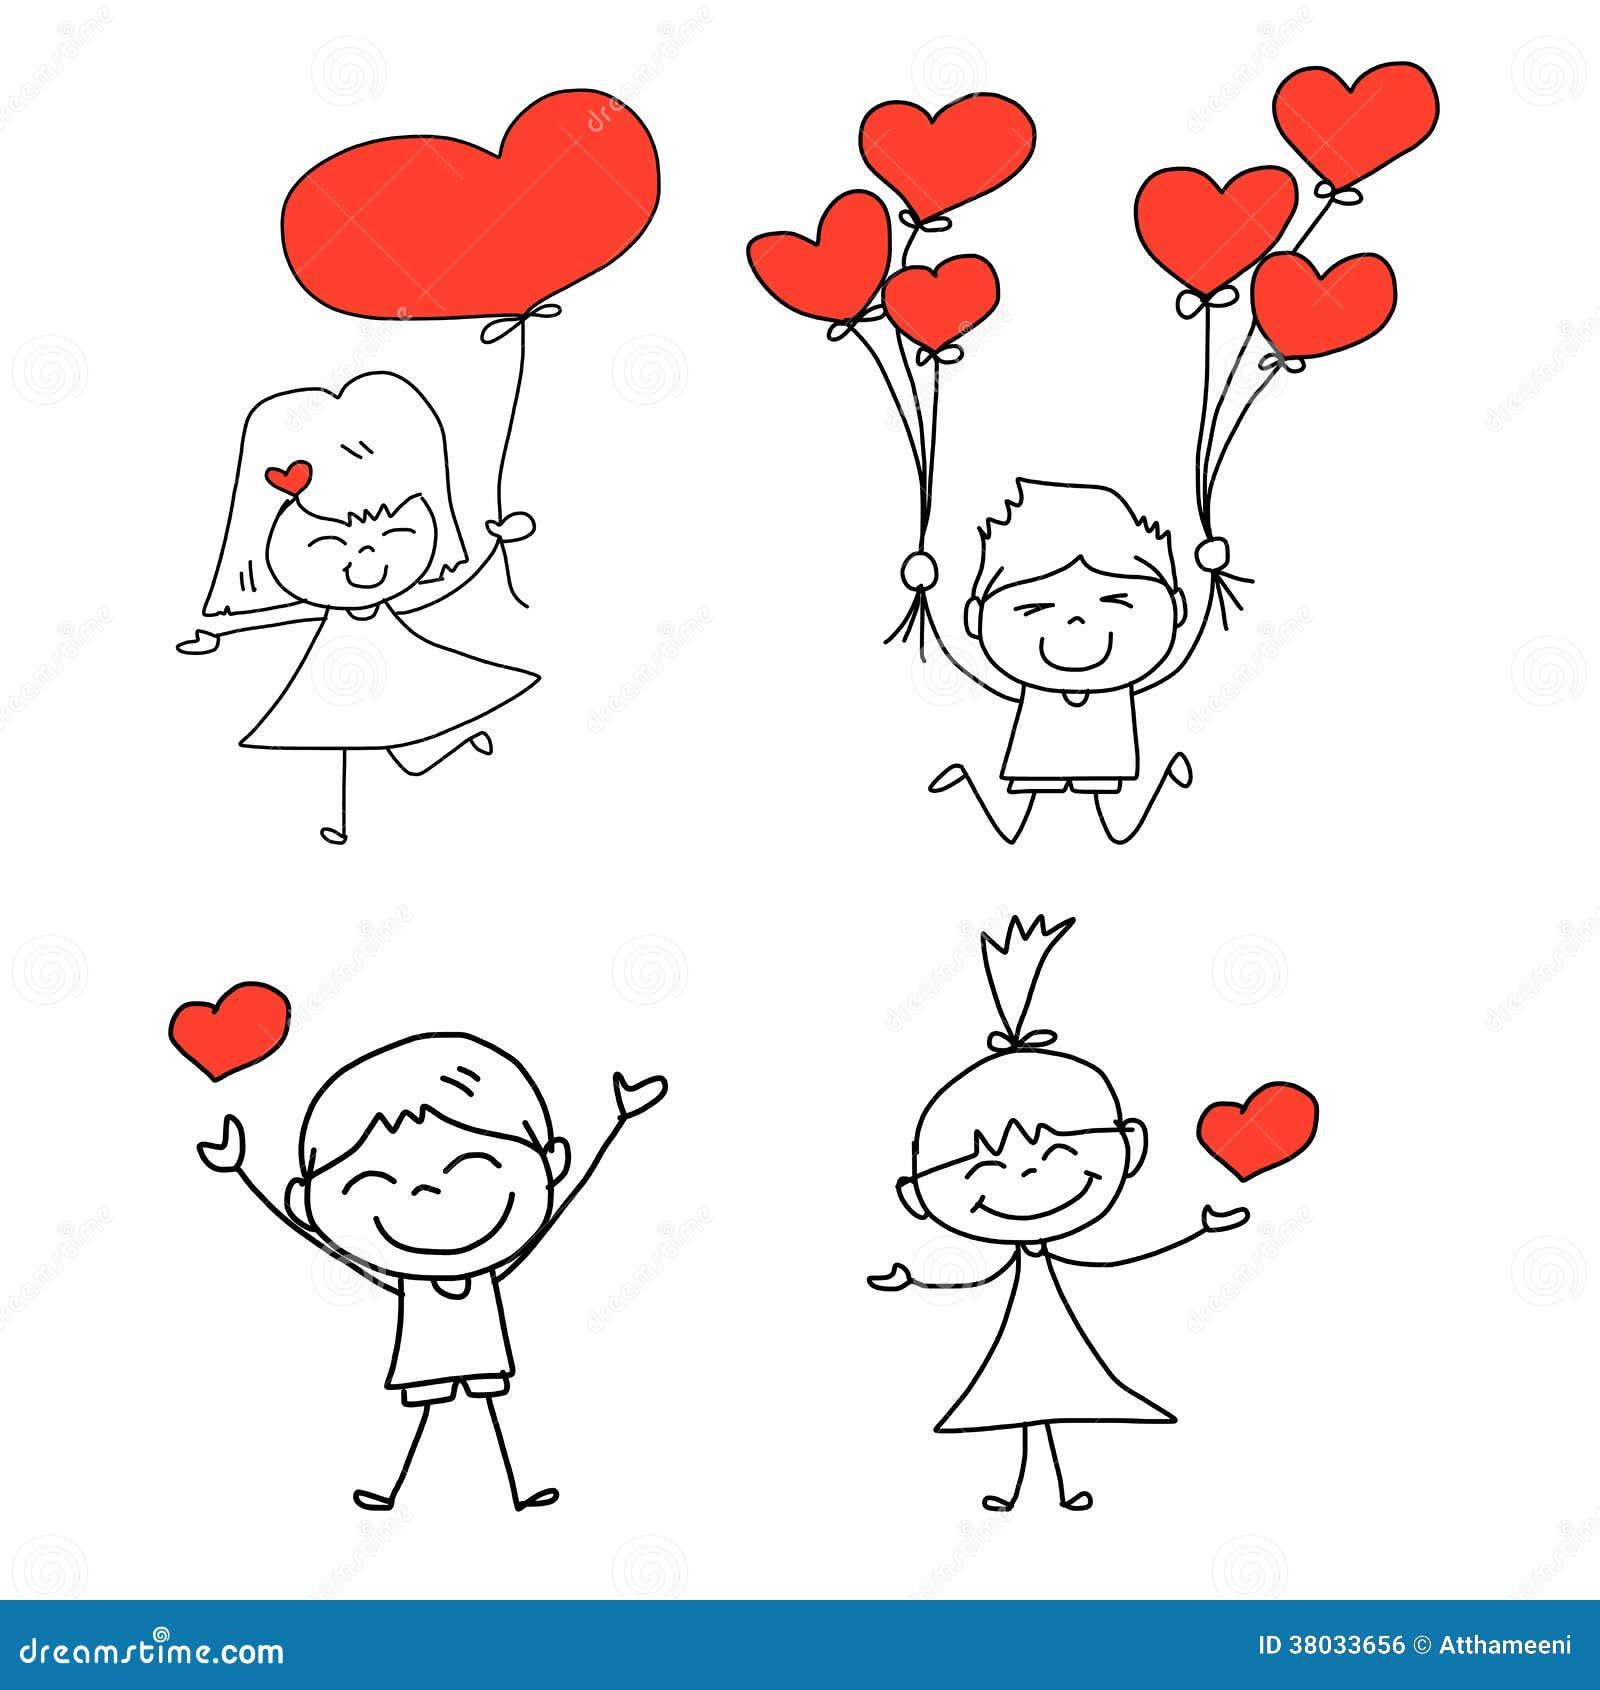 cartoon character Love Wallpaper : cartoon Hand-drawn Happy Love Royalty Free Stock Image - Image: 38033656